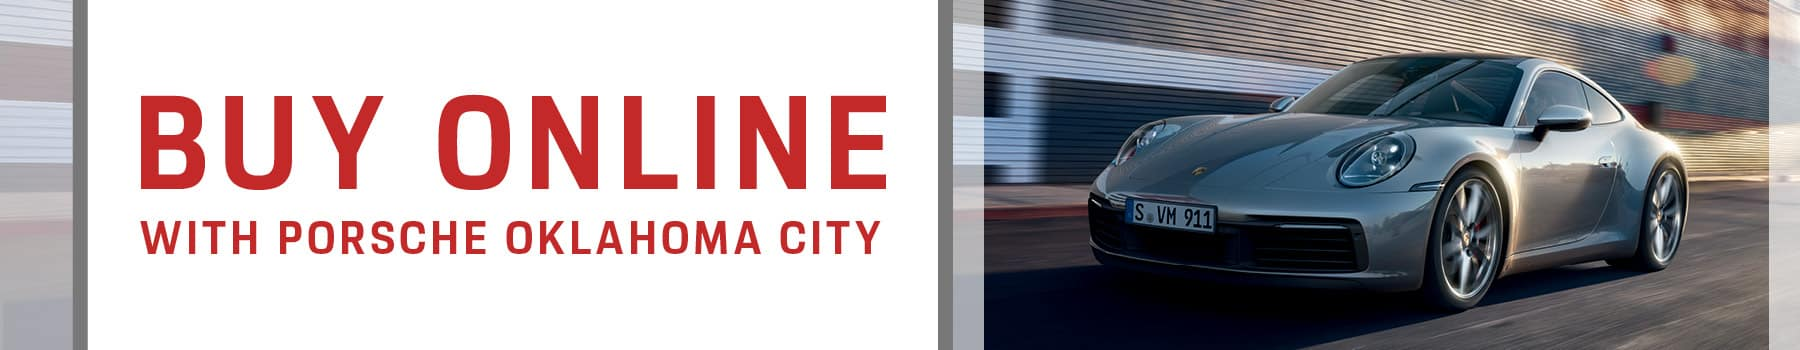 Buy Online Porsche Oklahoma City